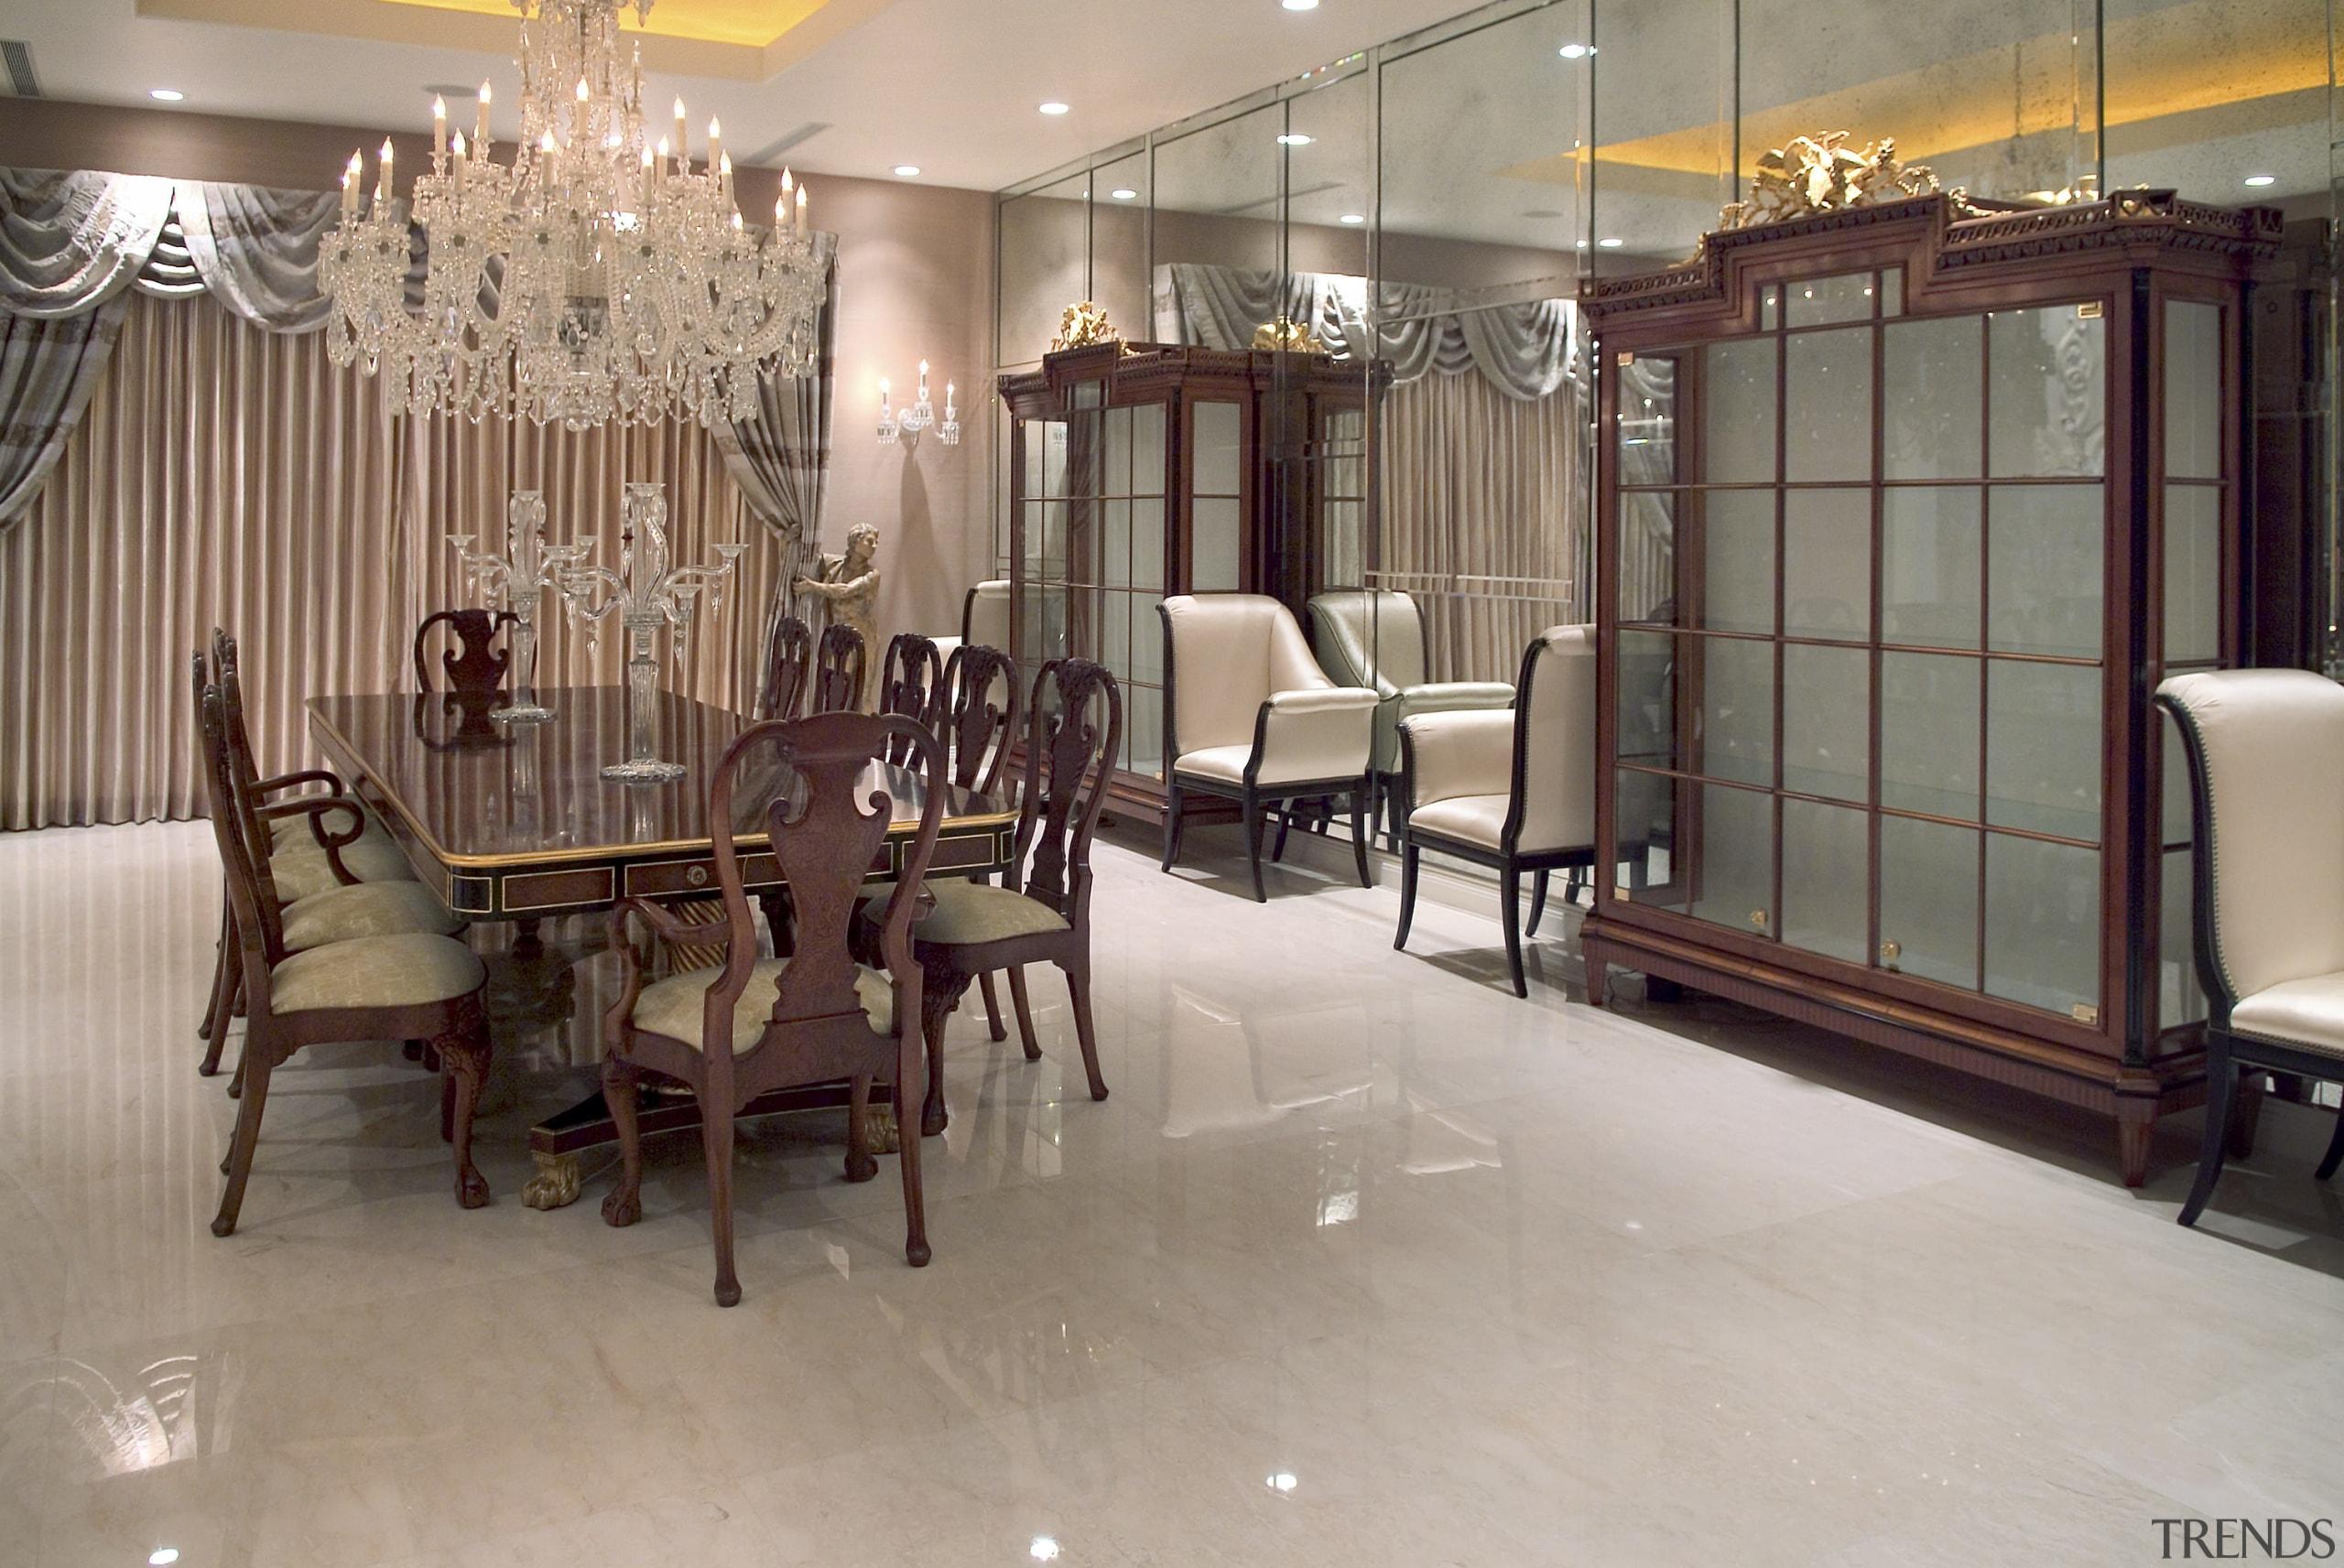 Dining Room - Dining Room - dining room dining room, floor, flooring, furniture, interior design, lobby, room, gray